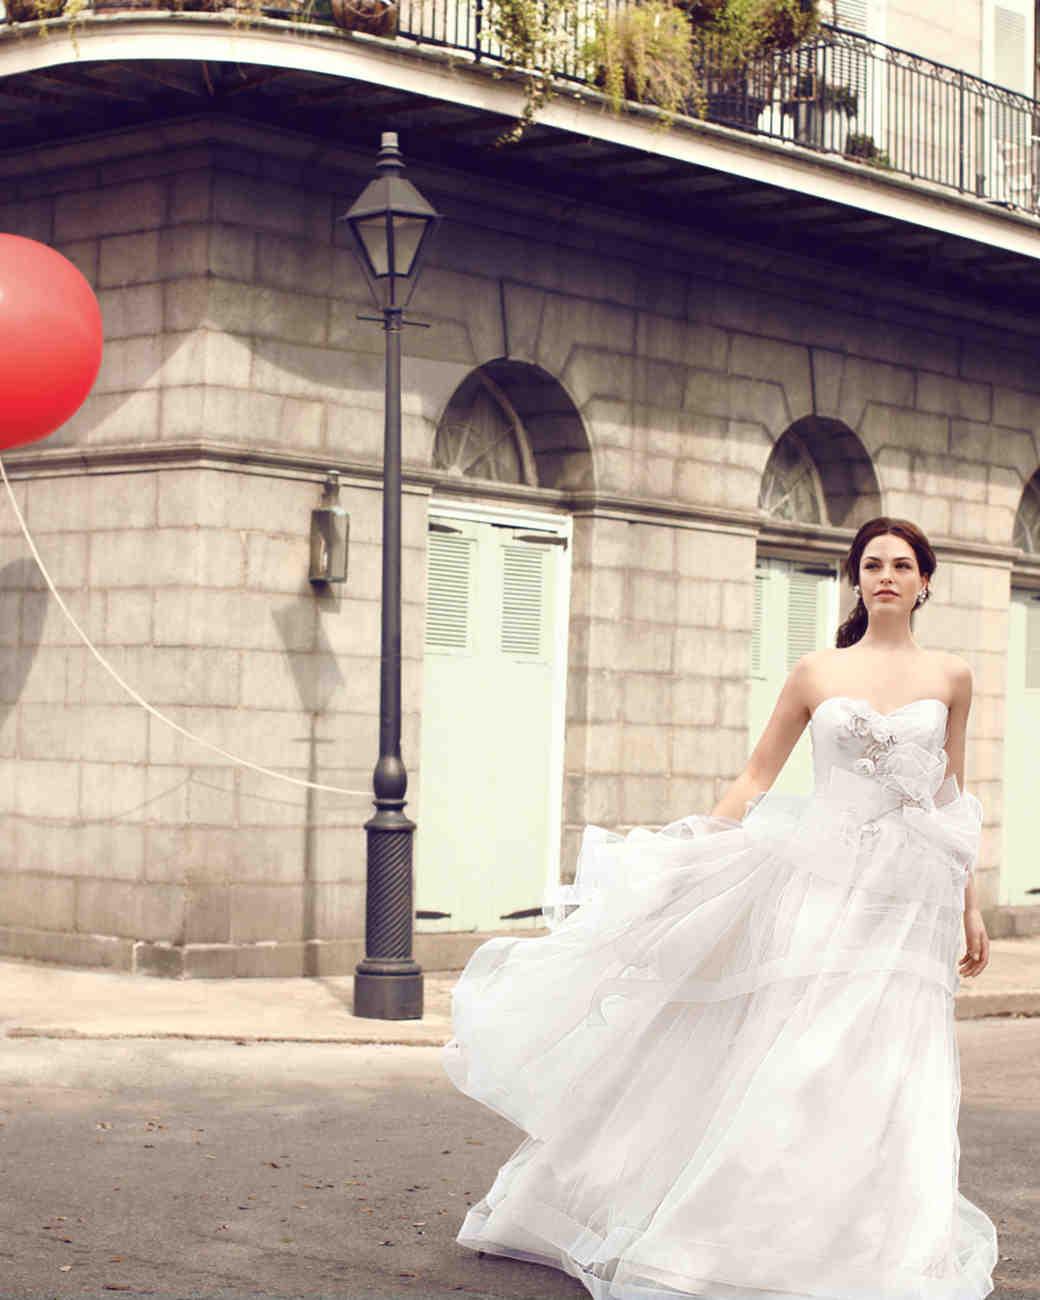 wedding-dress-1-mwd108453.jpg